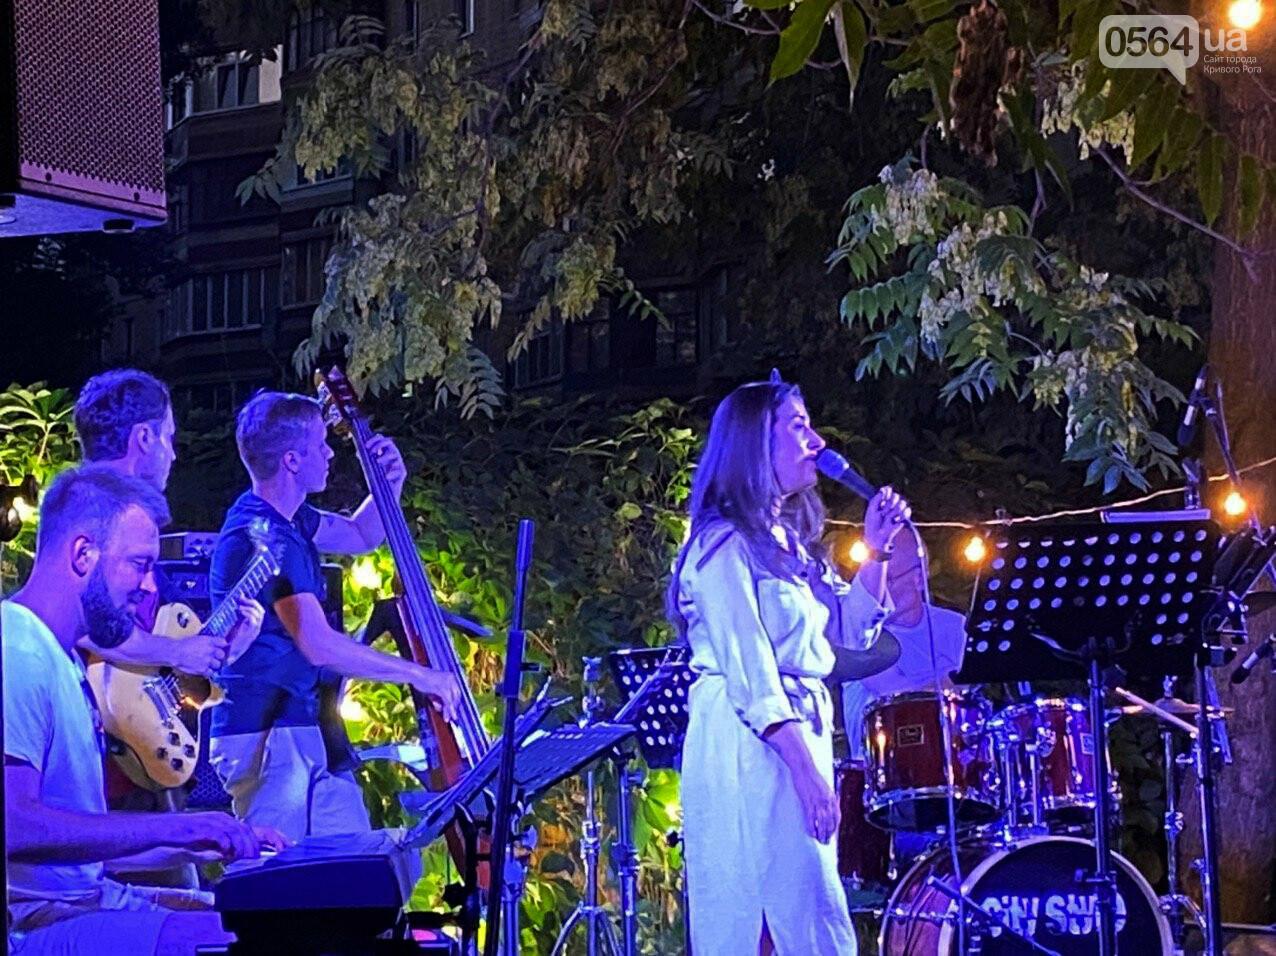 Под звездным небом криворожане наслаждались летним джазом от  Advantage Project, - ФОТО, ВИДЕО , фото-59